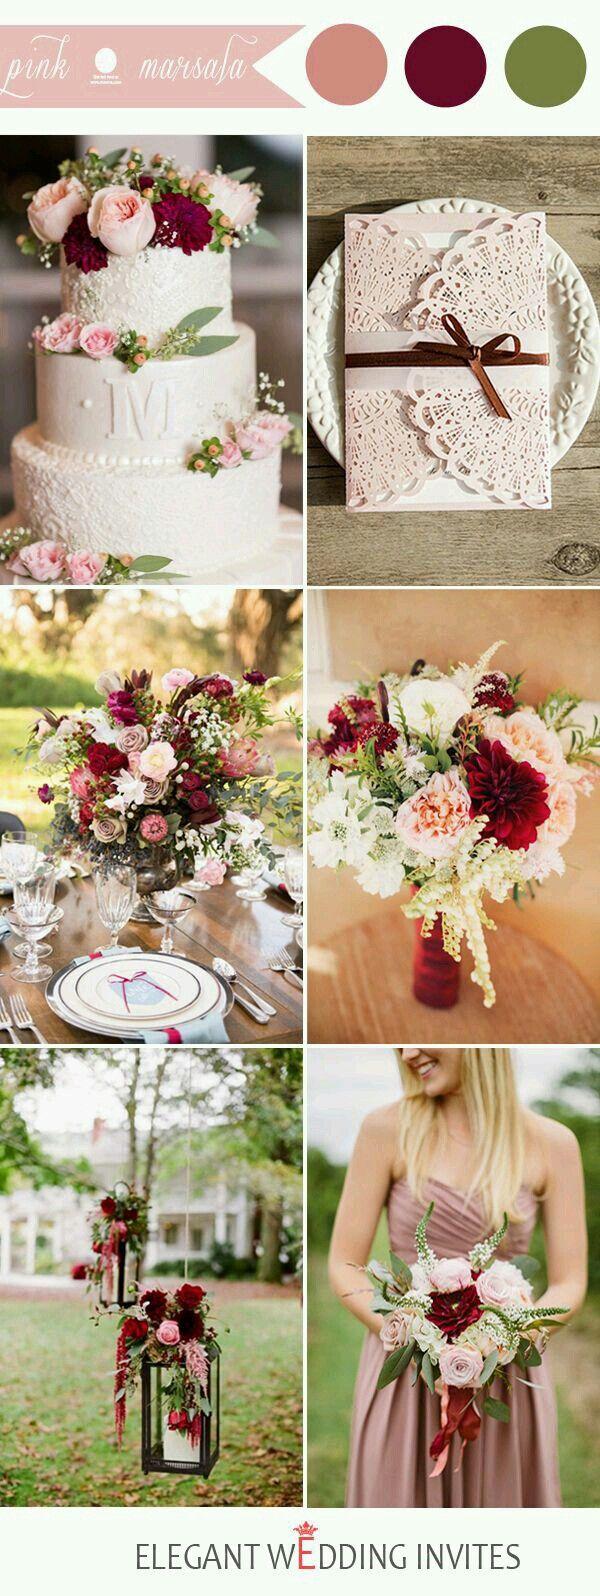 Wedding decorations using tulle october 2018  best Smith wedding images on Pinterest